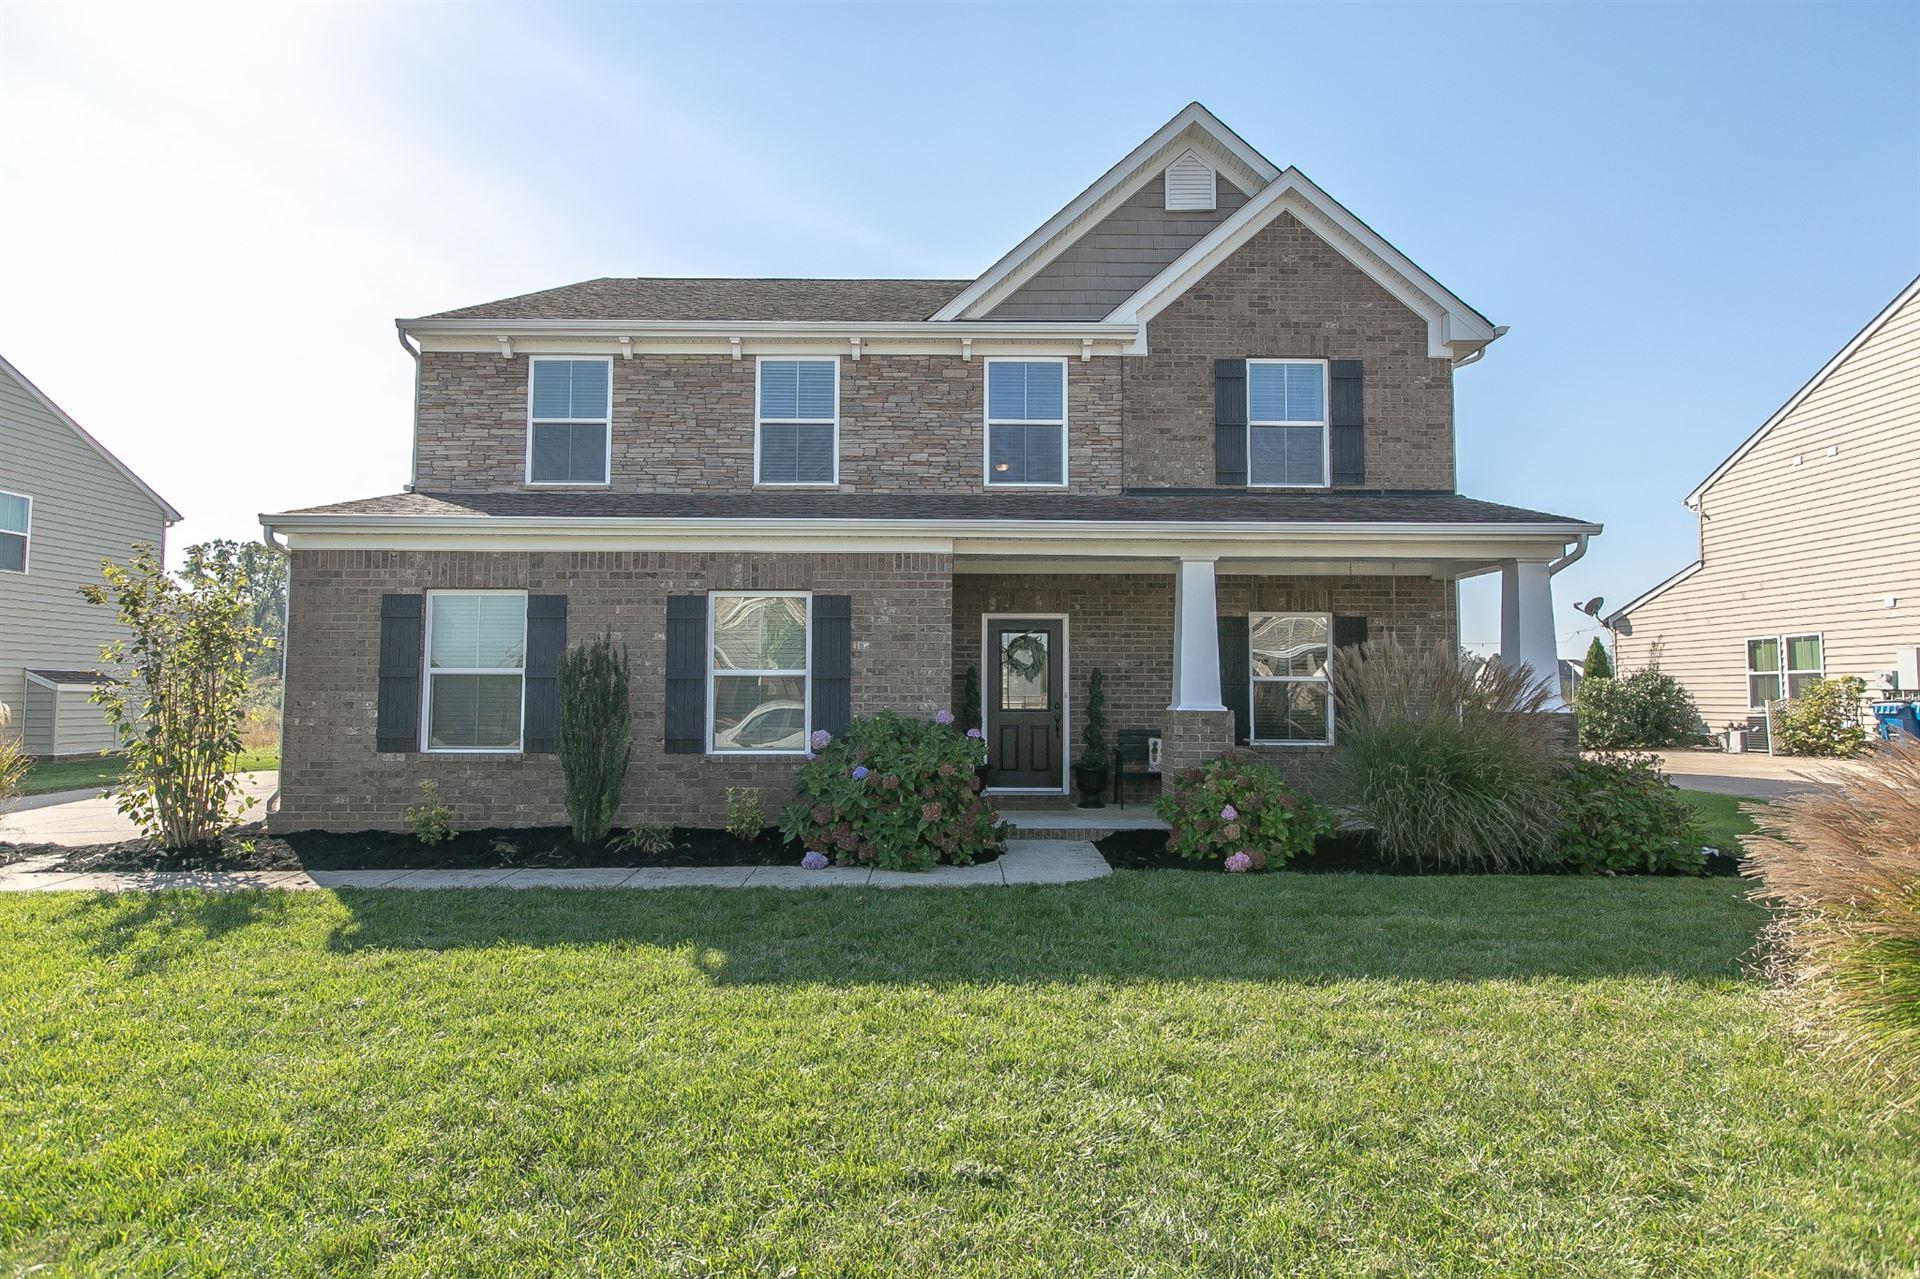 1714 Muirwood Blvd, Murfreesboro, TN 37128 - MLS#: 2302030